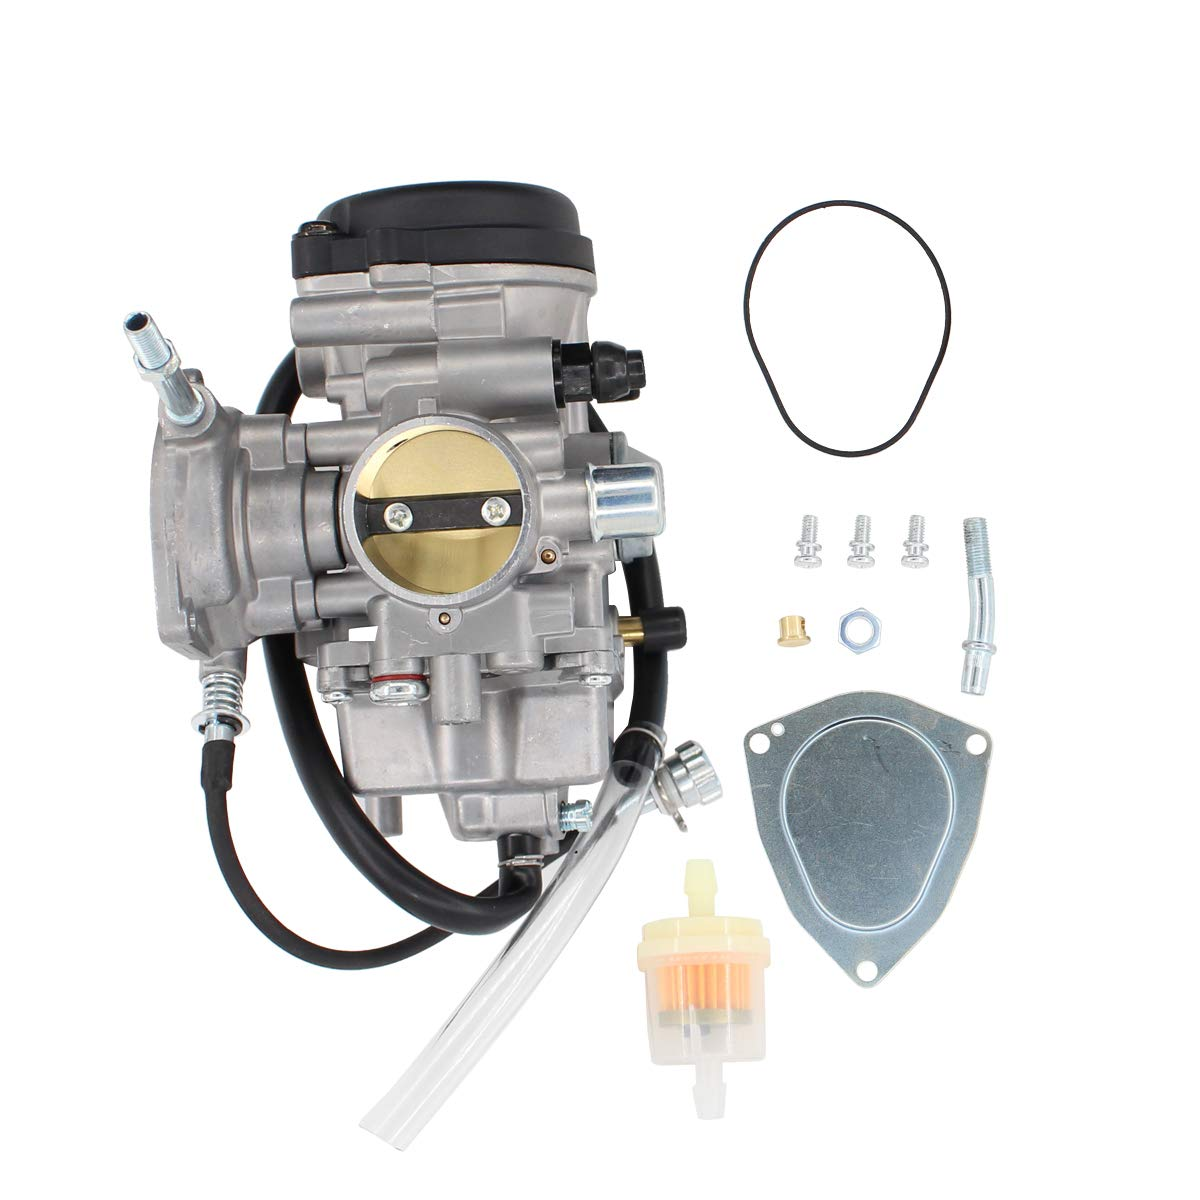 Brand New Carburetor for 2003-2006 Yamaha Kodiak 450 ATV NEW